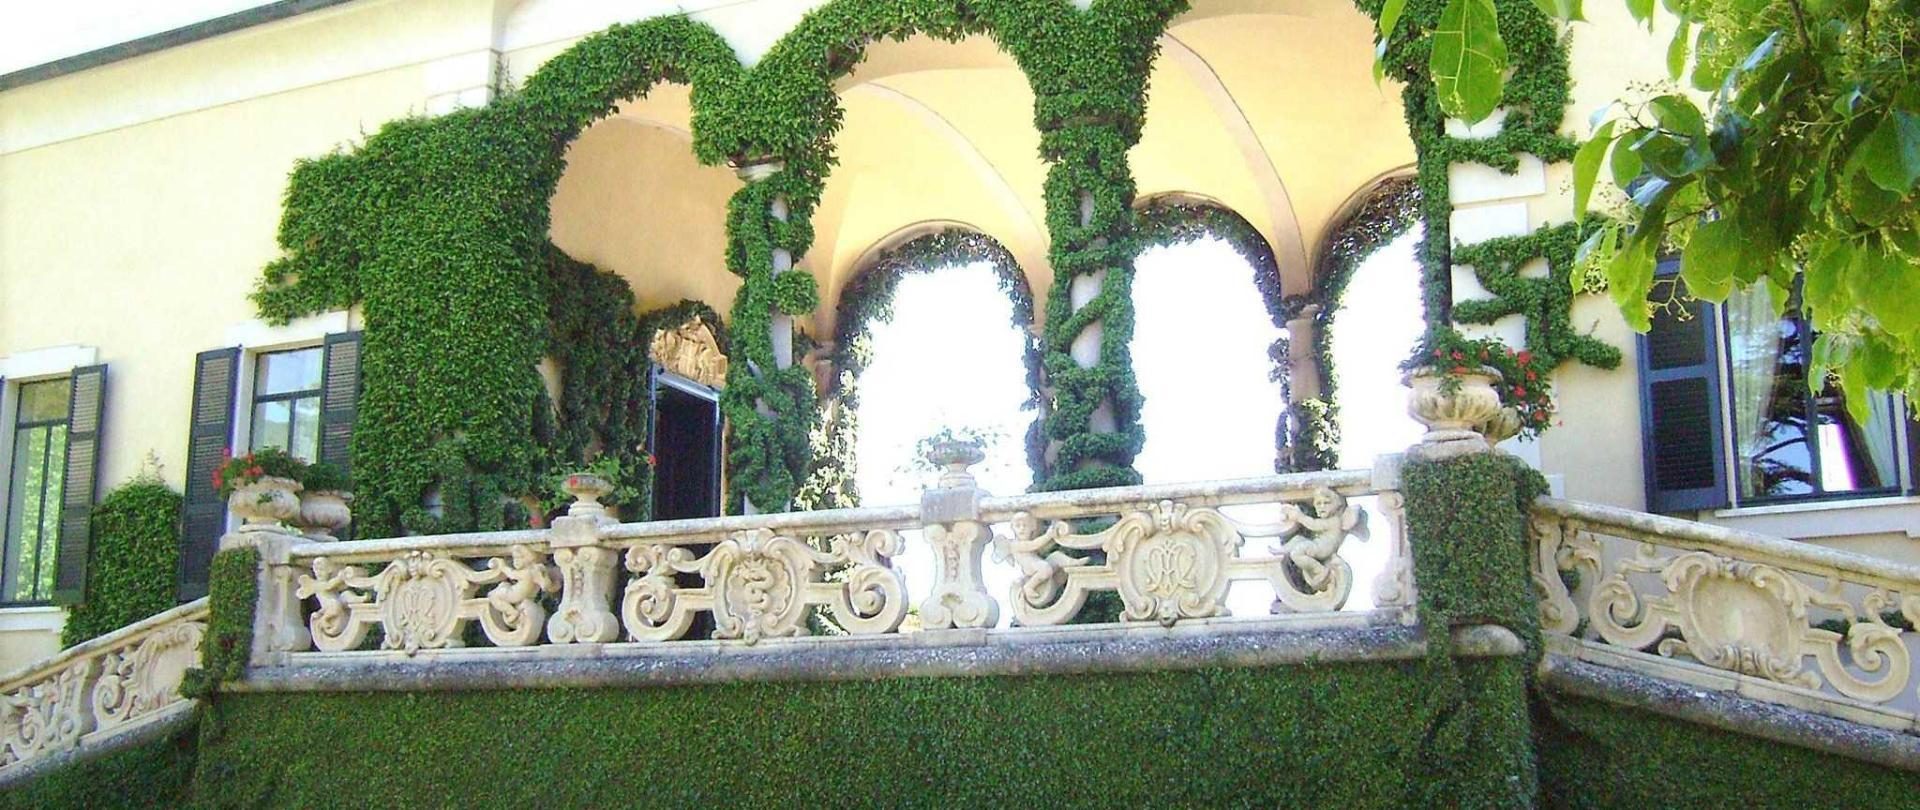 villa-del-balbianello-022.JPG